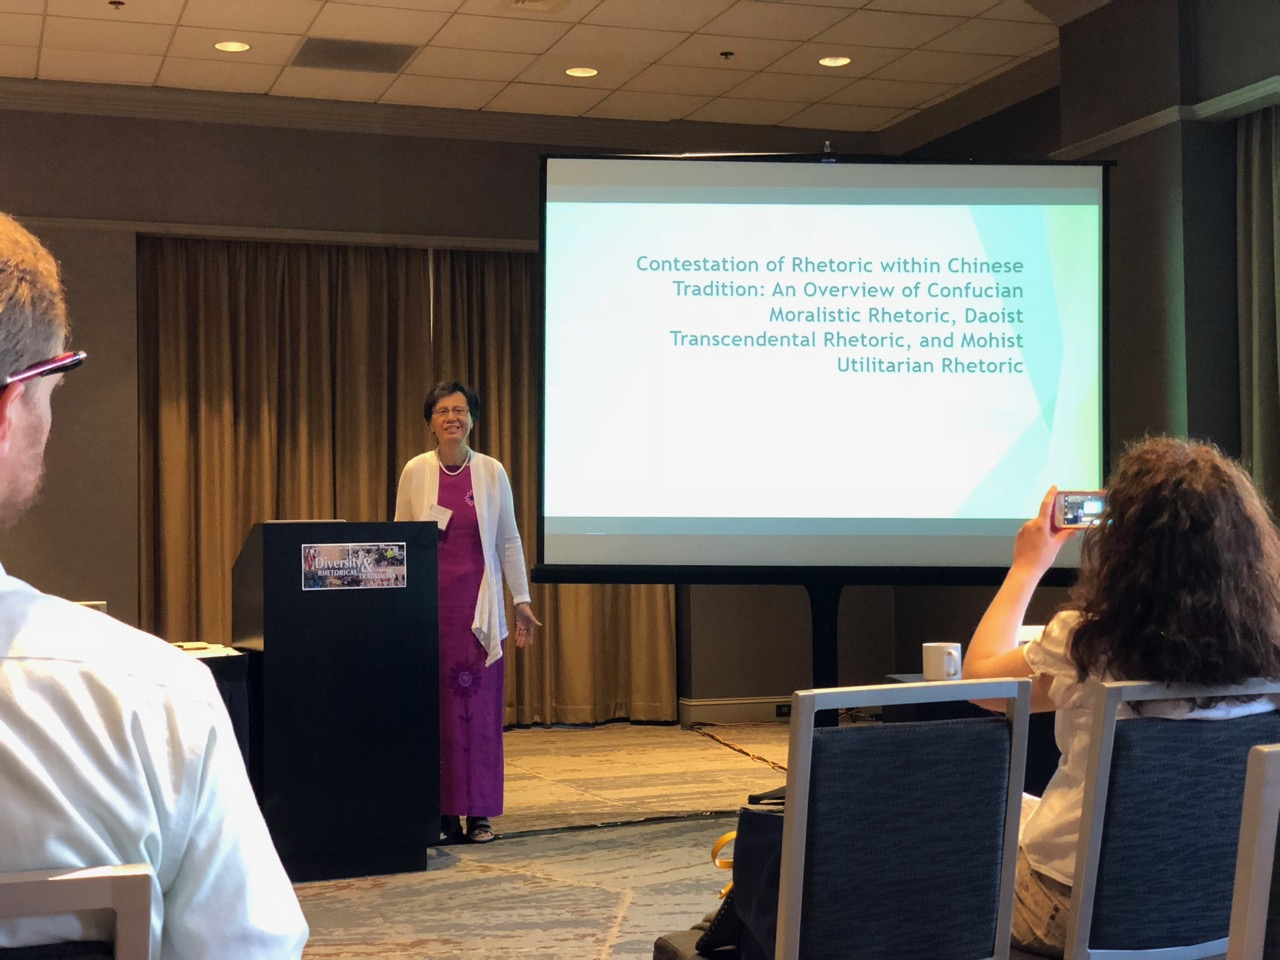 "Xing Lu, DePaul University, ""Contestation of Rhetoric within the Chinese Tradition: An Overview of Confucian Moralistic Rhetoric, Daoist Transcendental Rhetoric, and Mohist Utilitarian Rhetoric"""